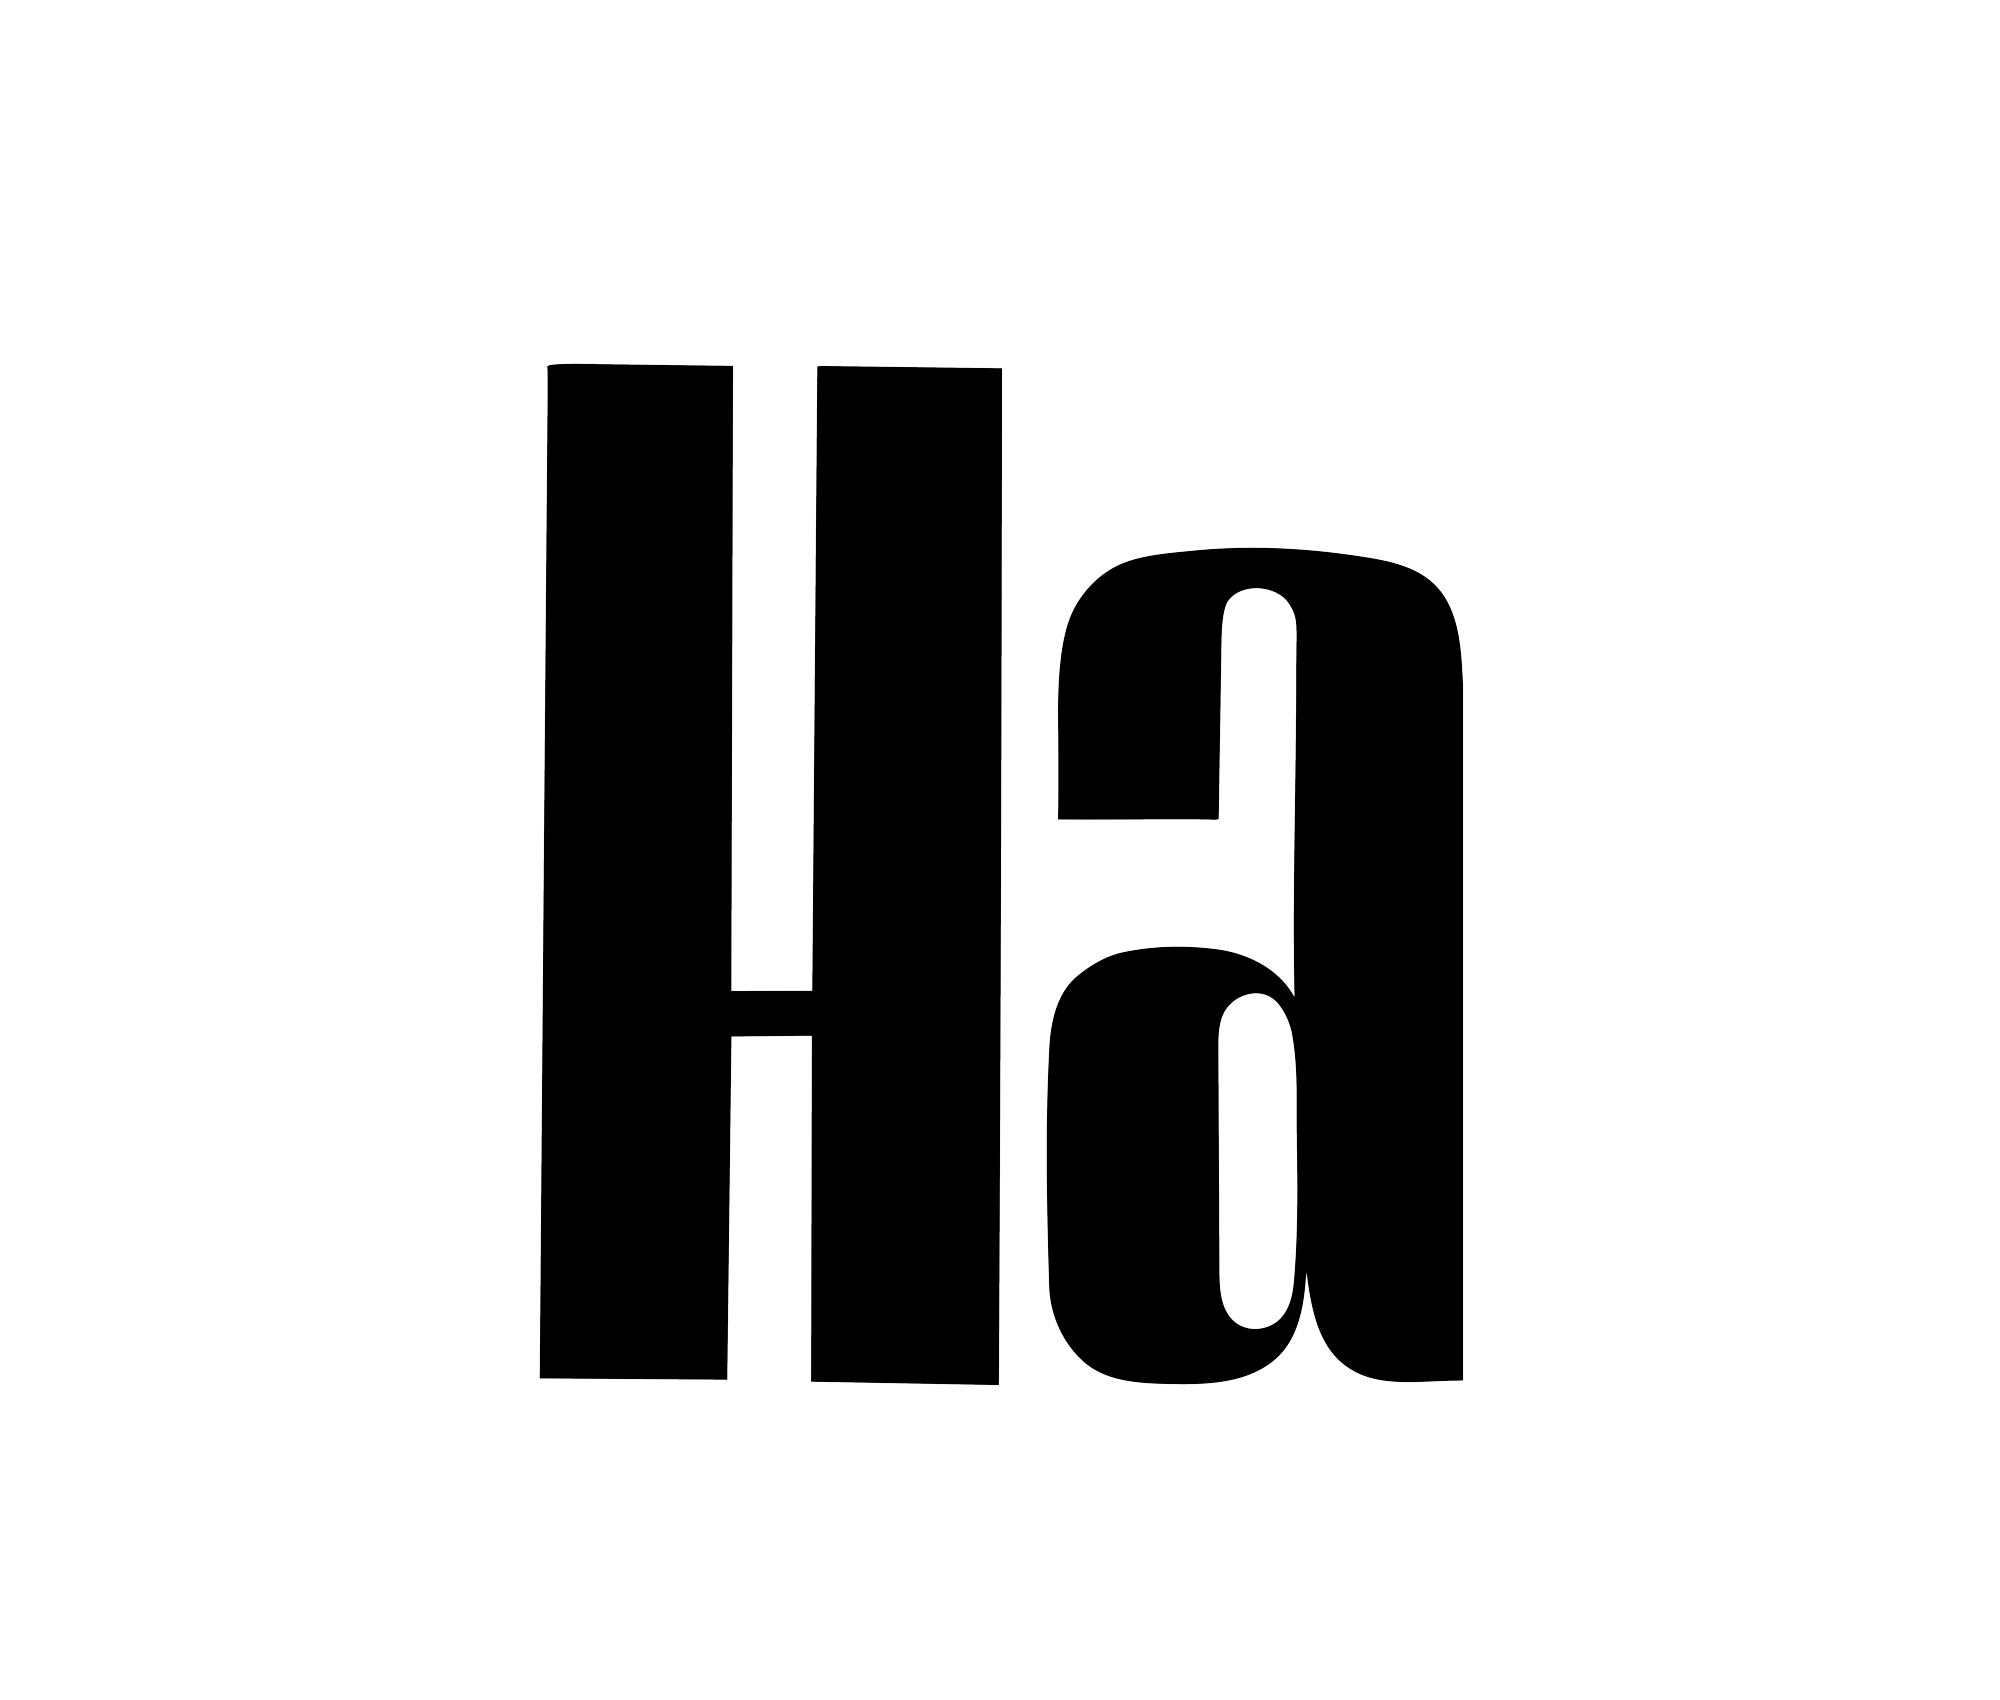 Hastile